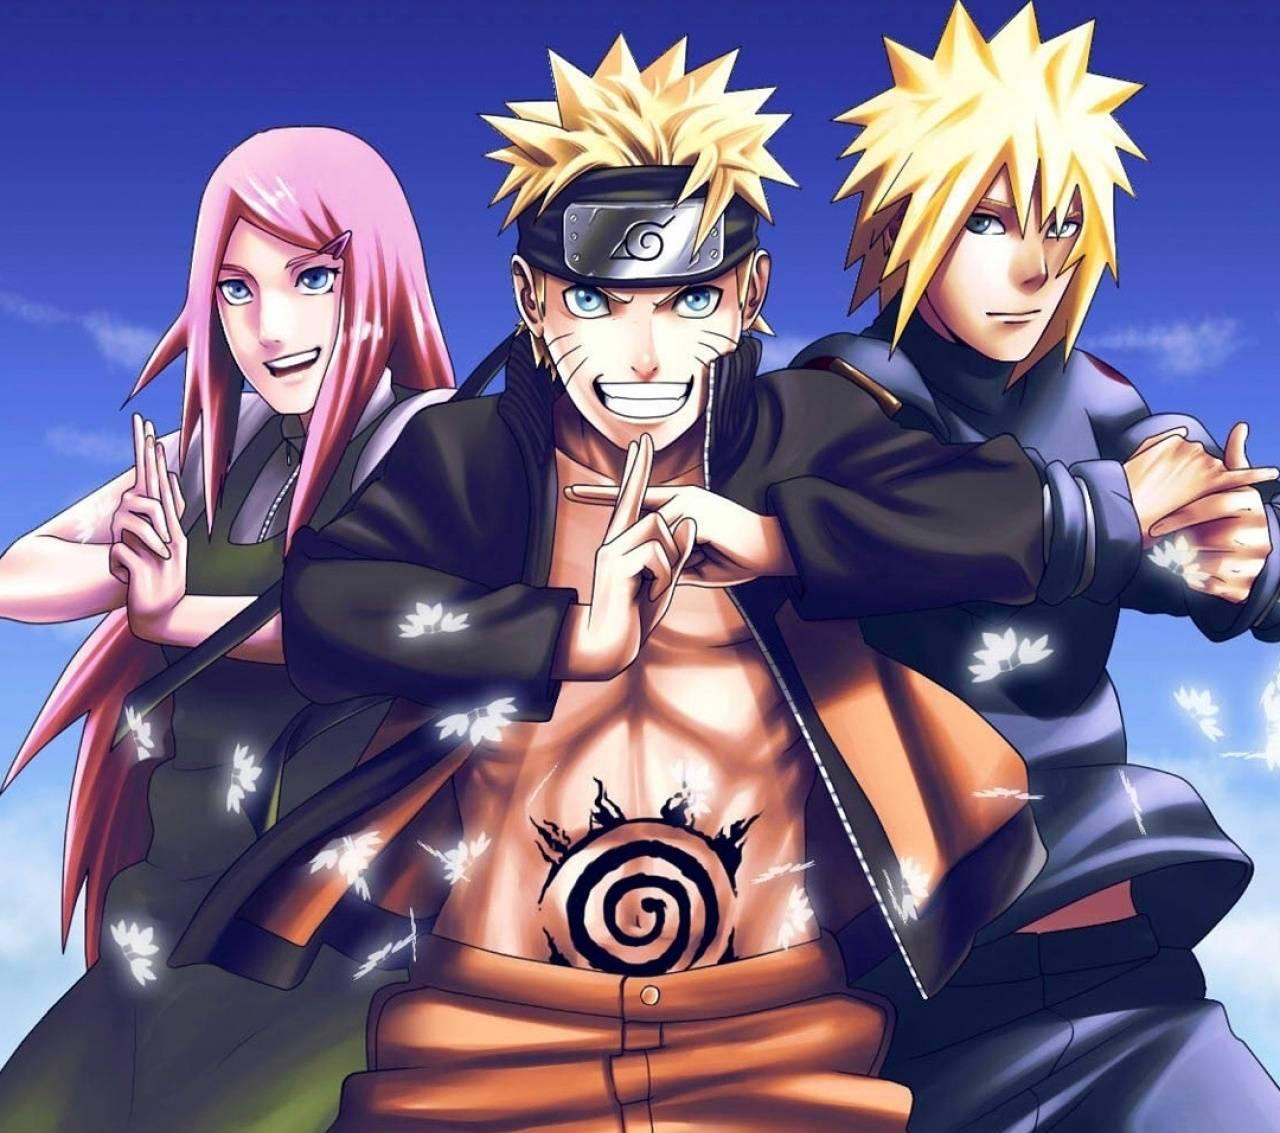 Naruto Family Wallpaper By Matheusgrilo 46 Free On Zedge